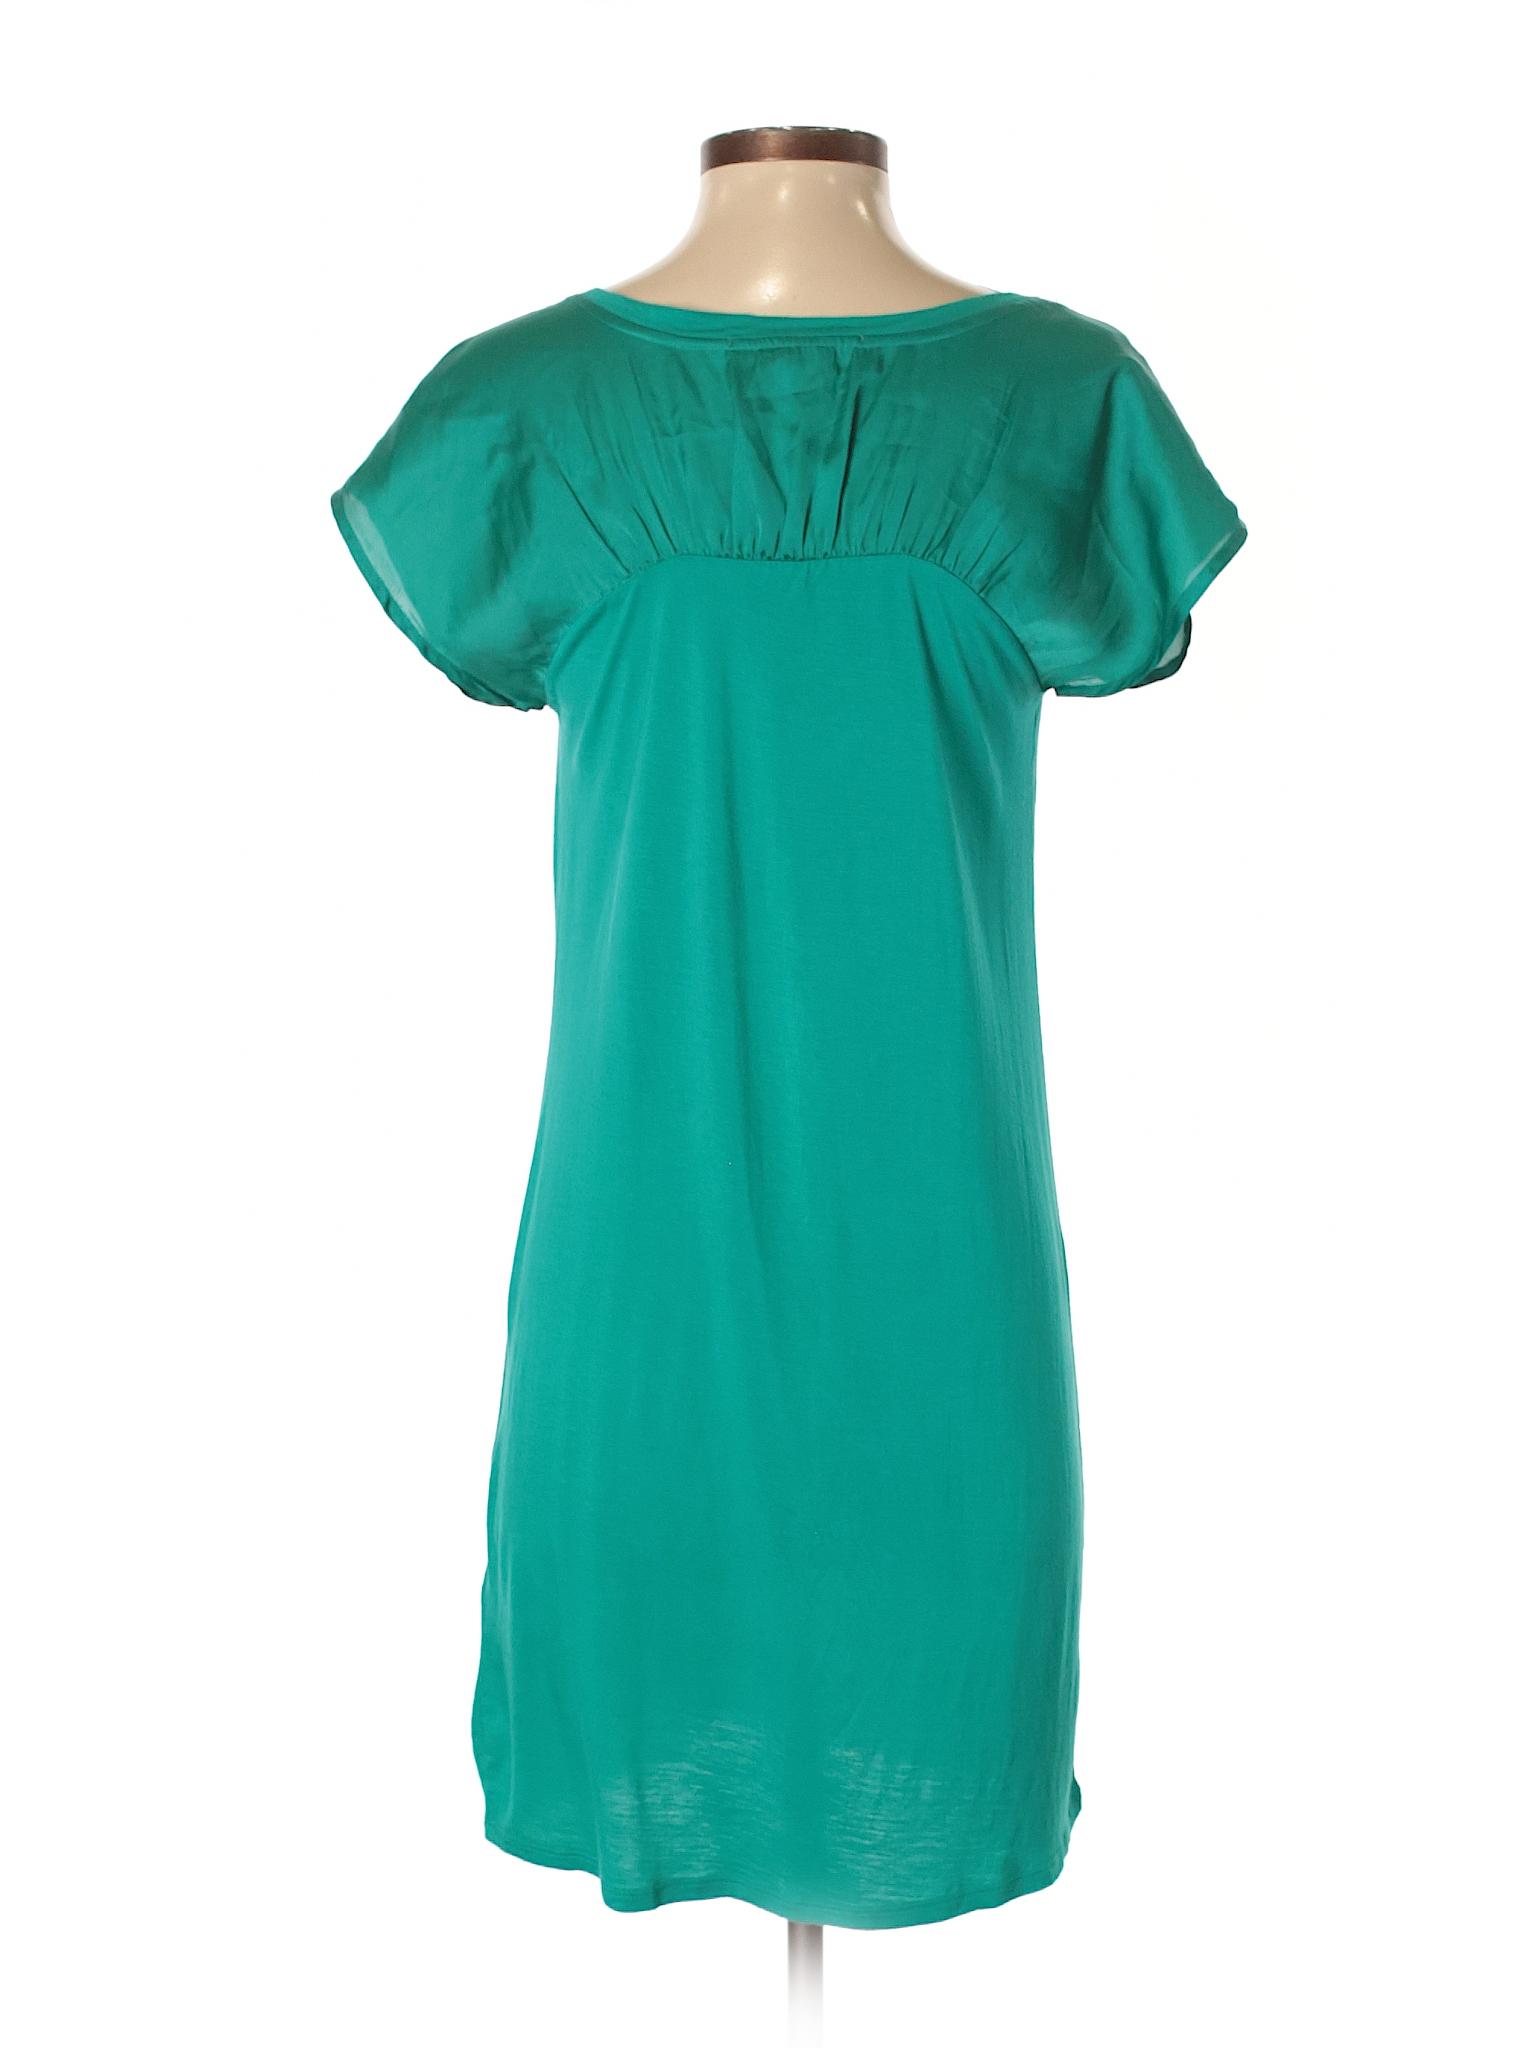 Casual Love Boutique winter Dress 21 qt4Agx0